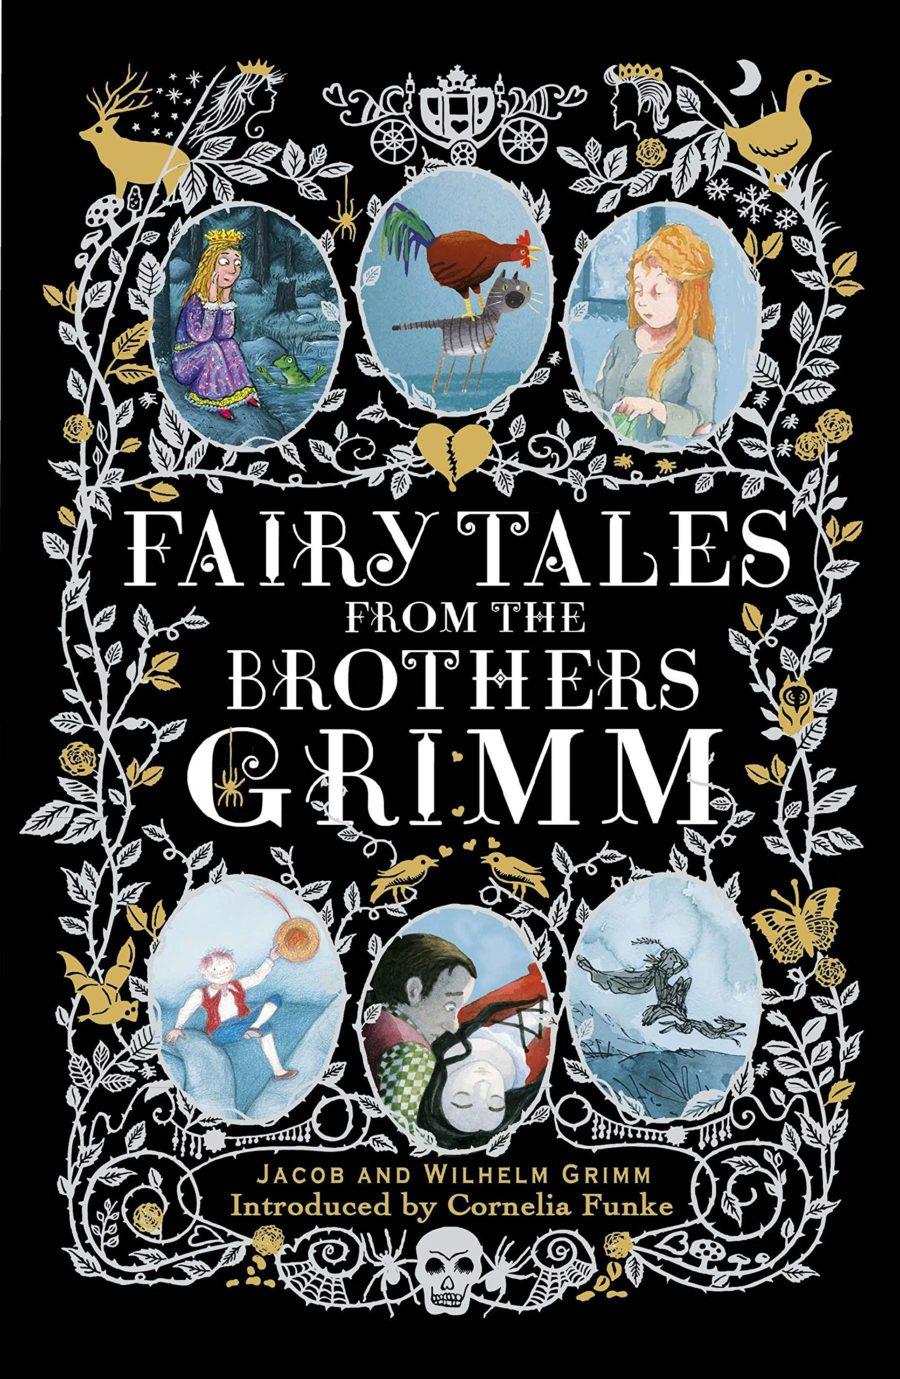 FairyTalesfromBrothersGrimm